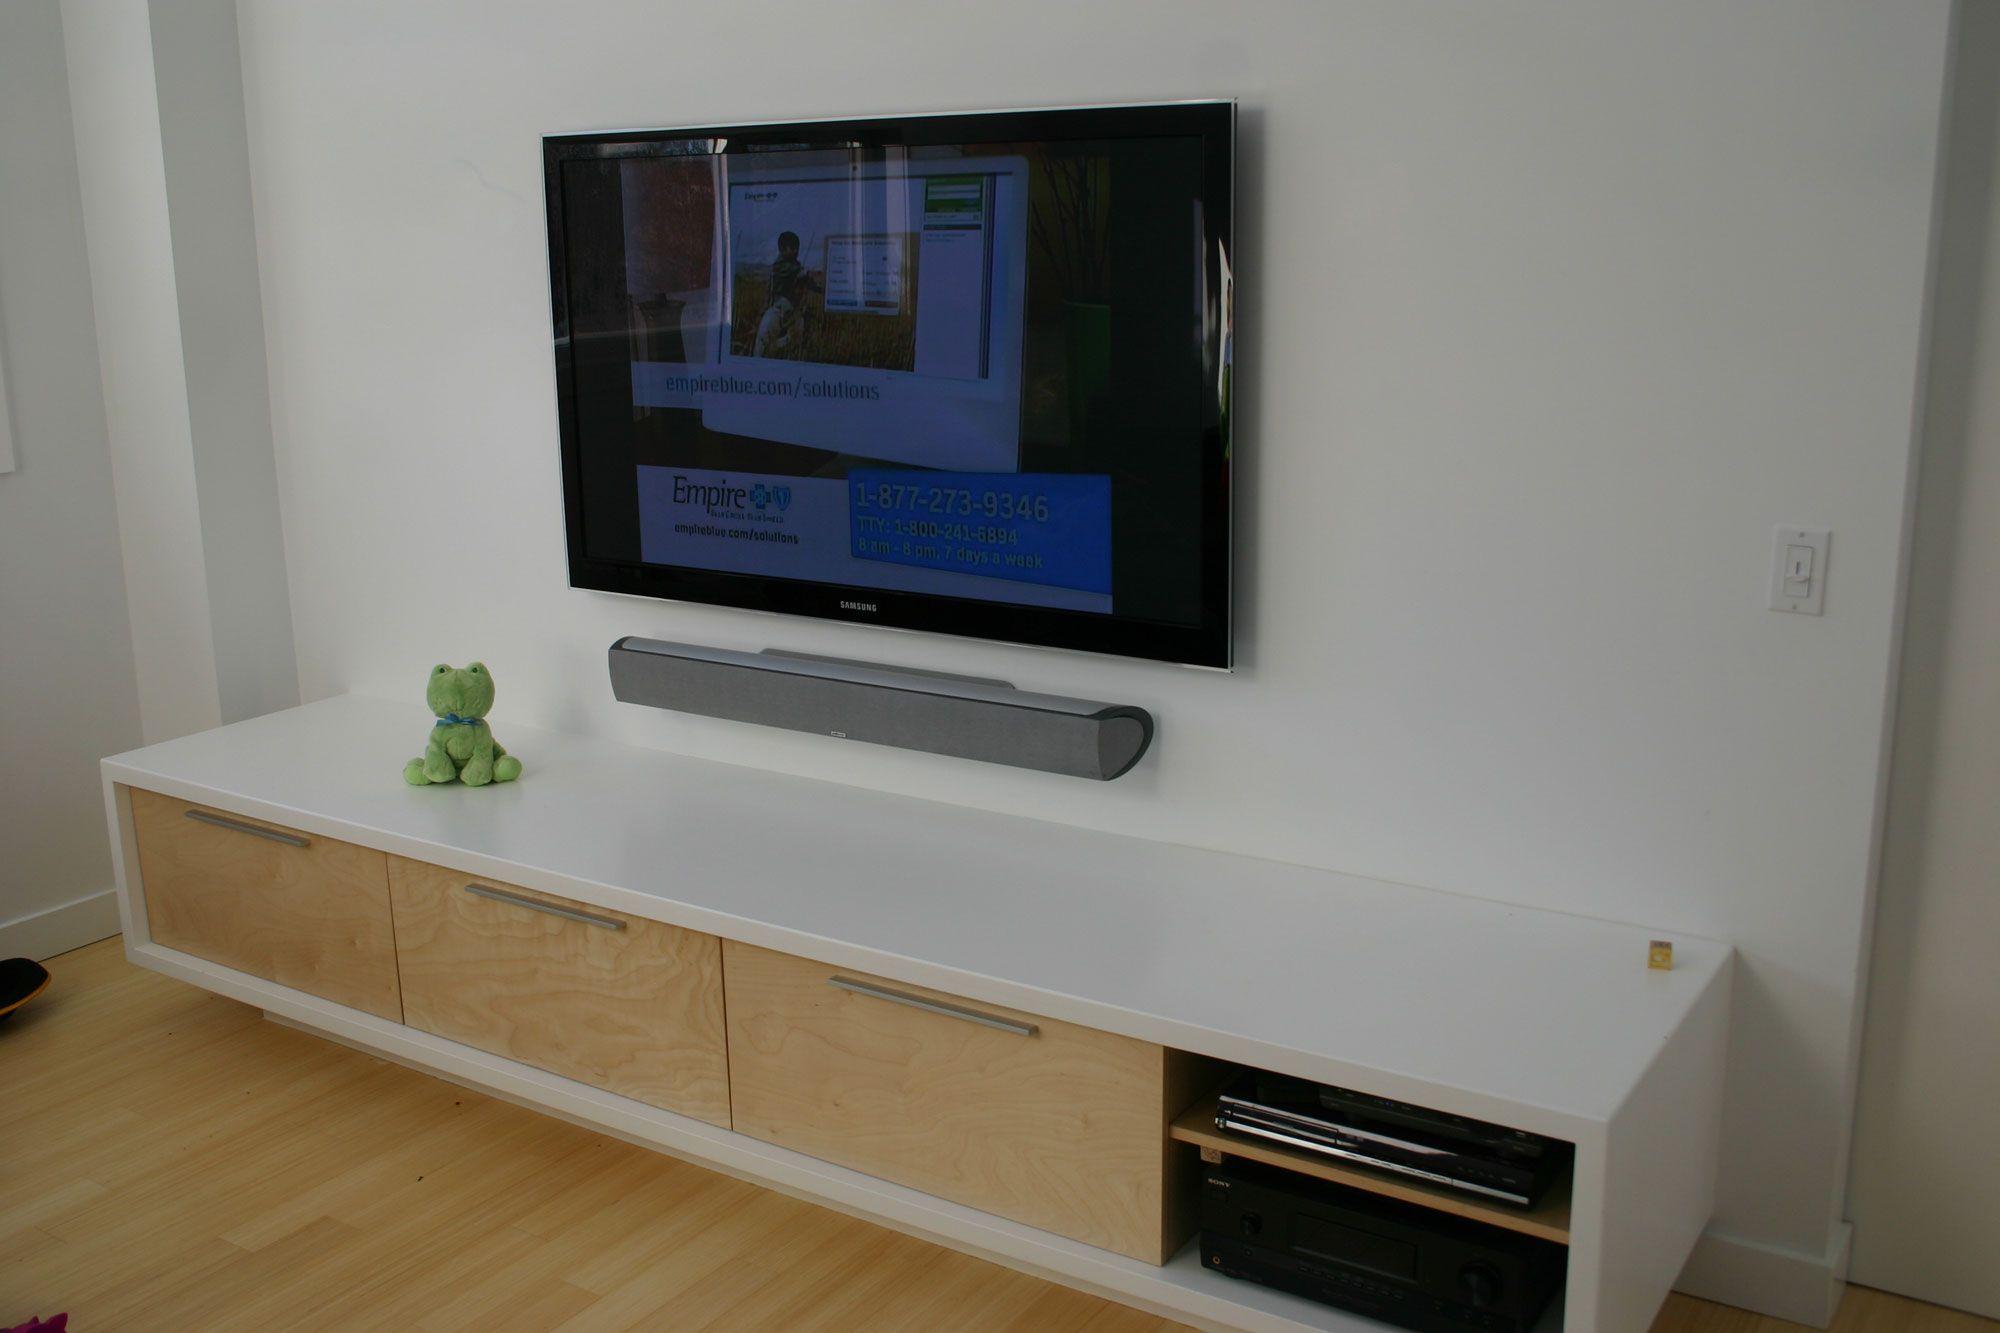 Charming Tv Shelves Design Flat Tv Mounting Ideas Flat Tv Mounting